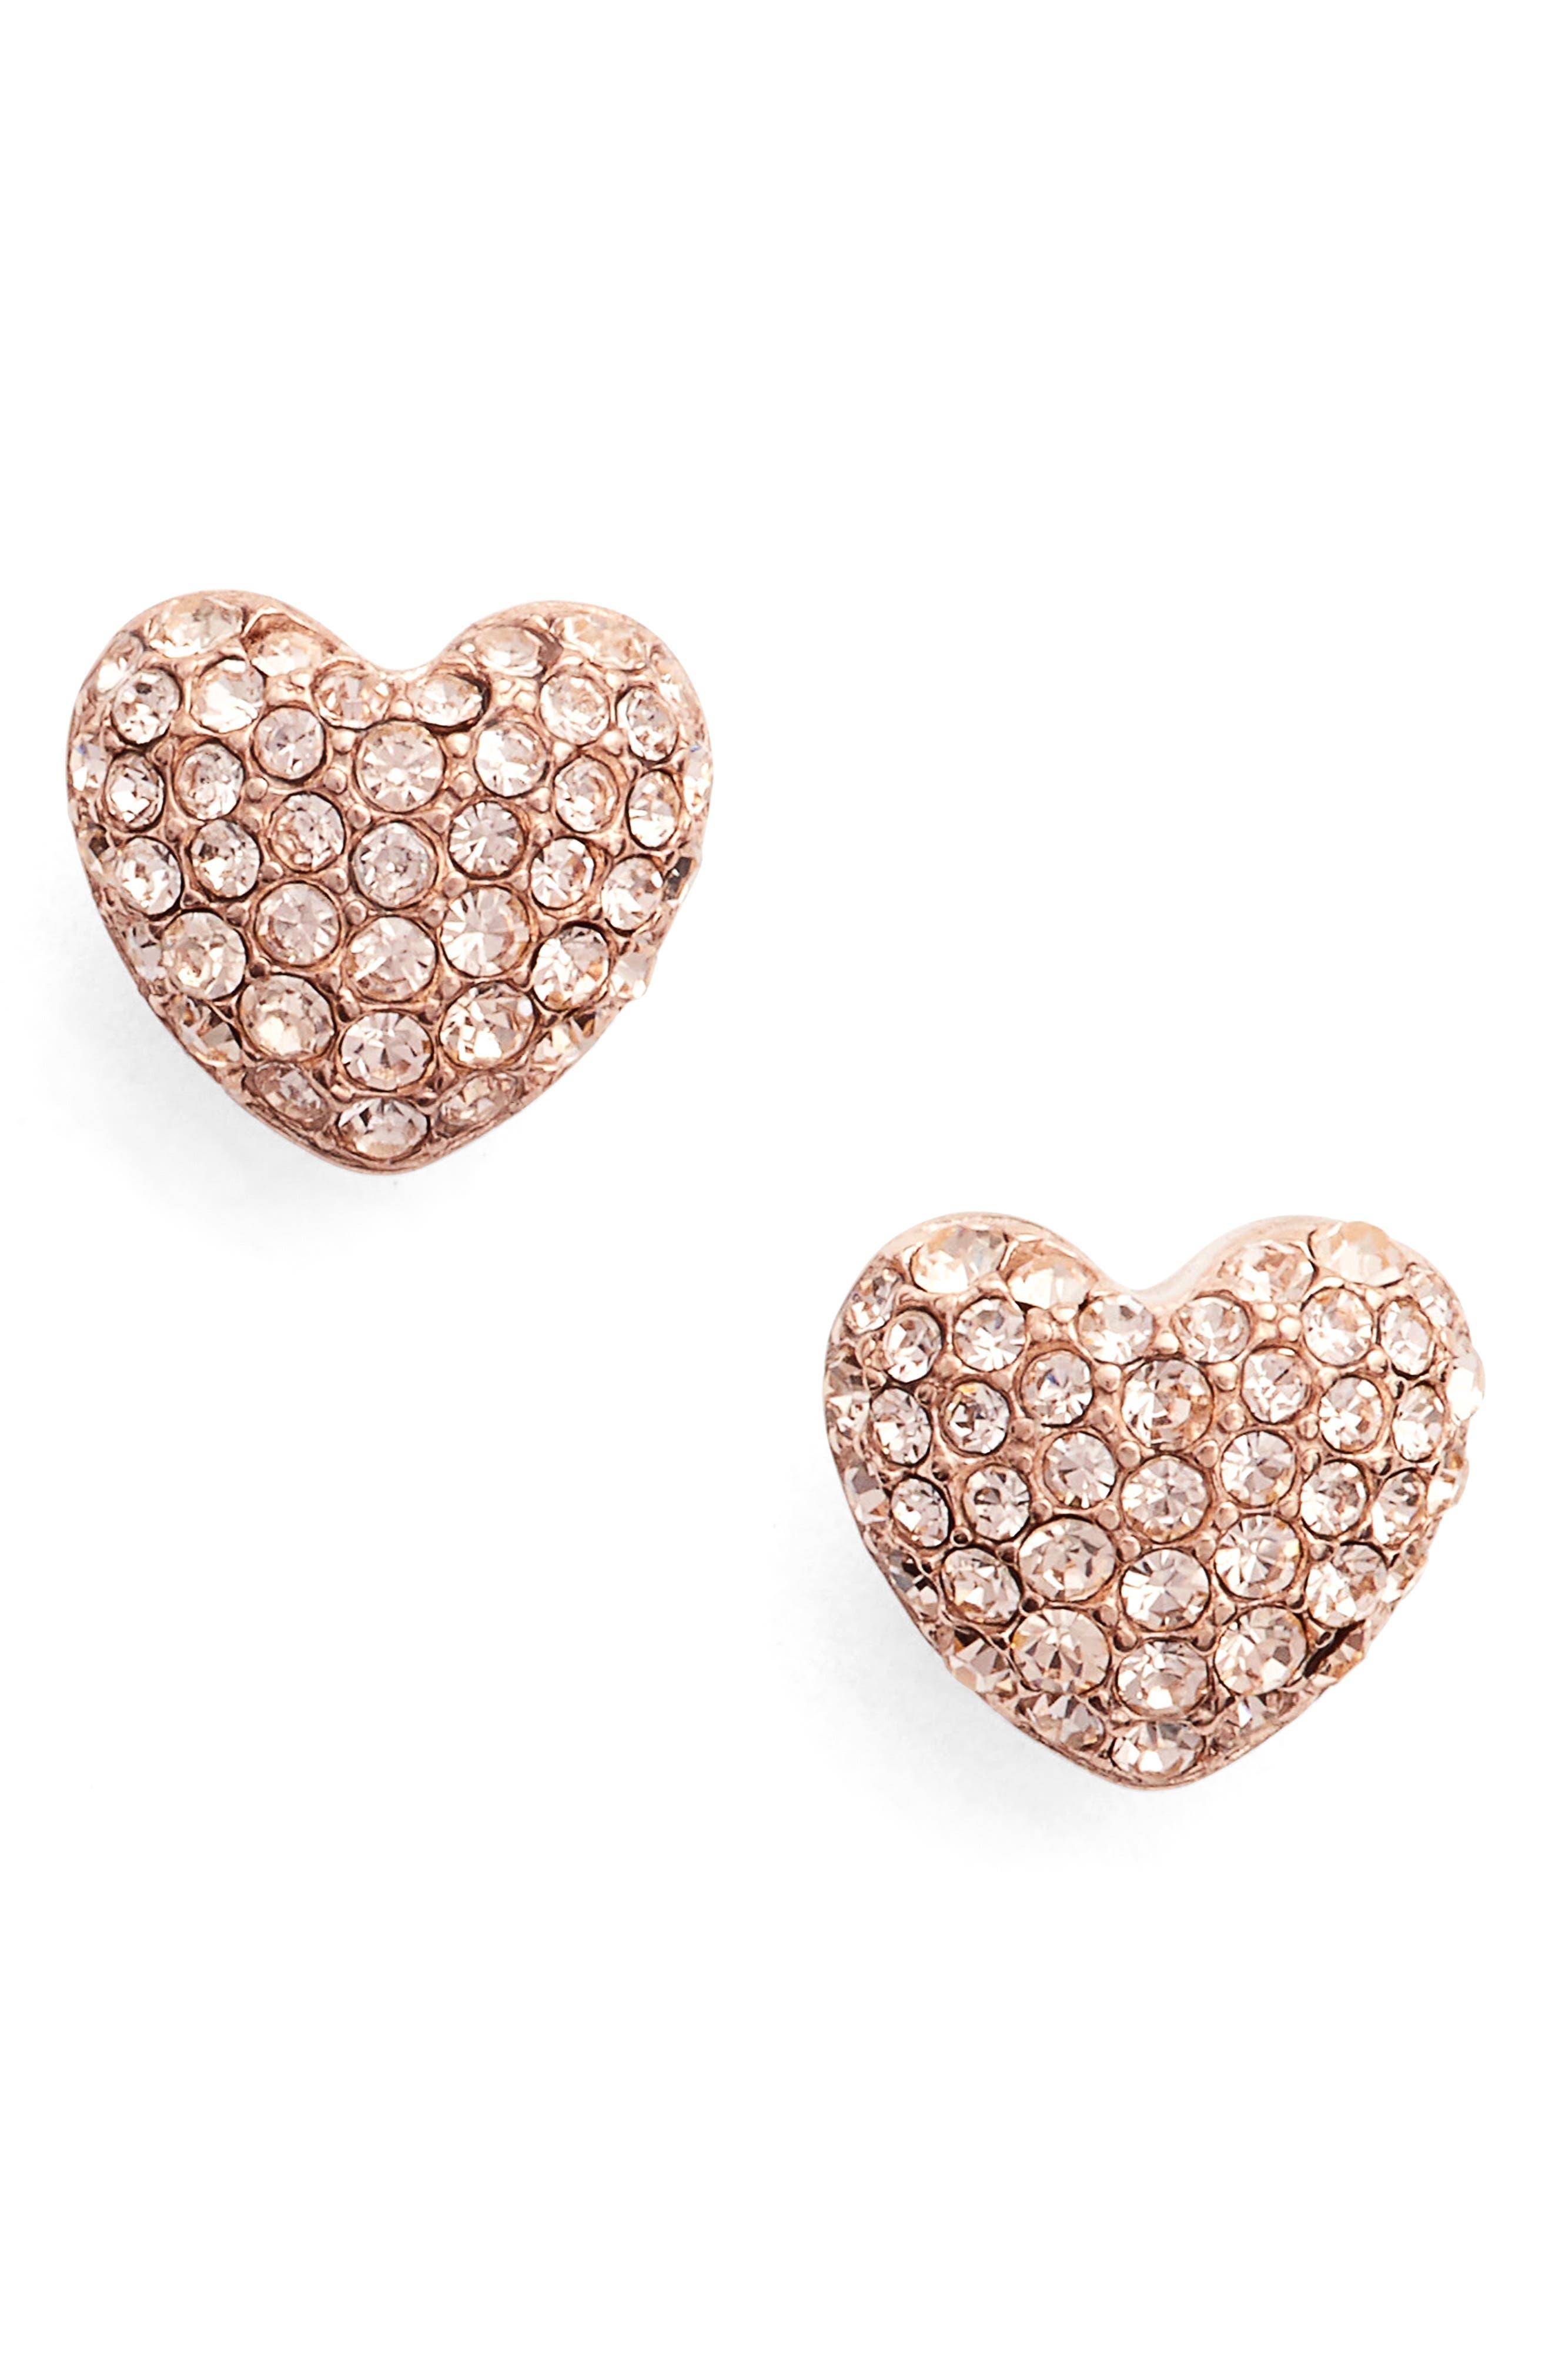 Heart Stud Earrings,                         Main,                         color, Rose Gold